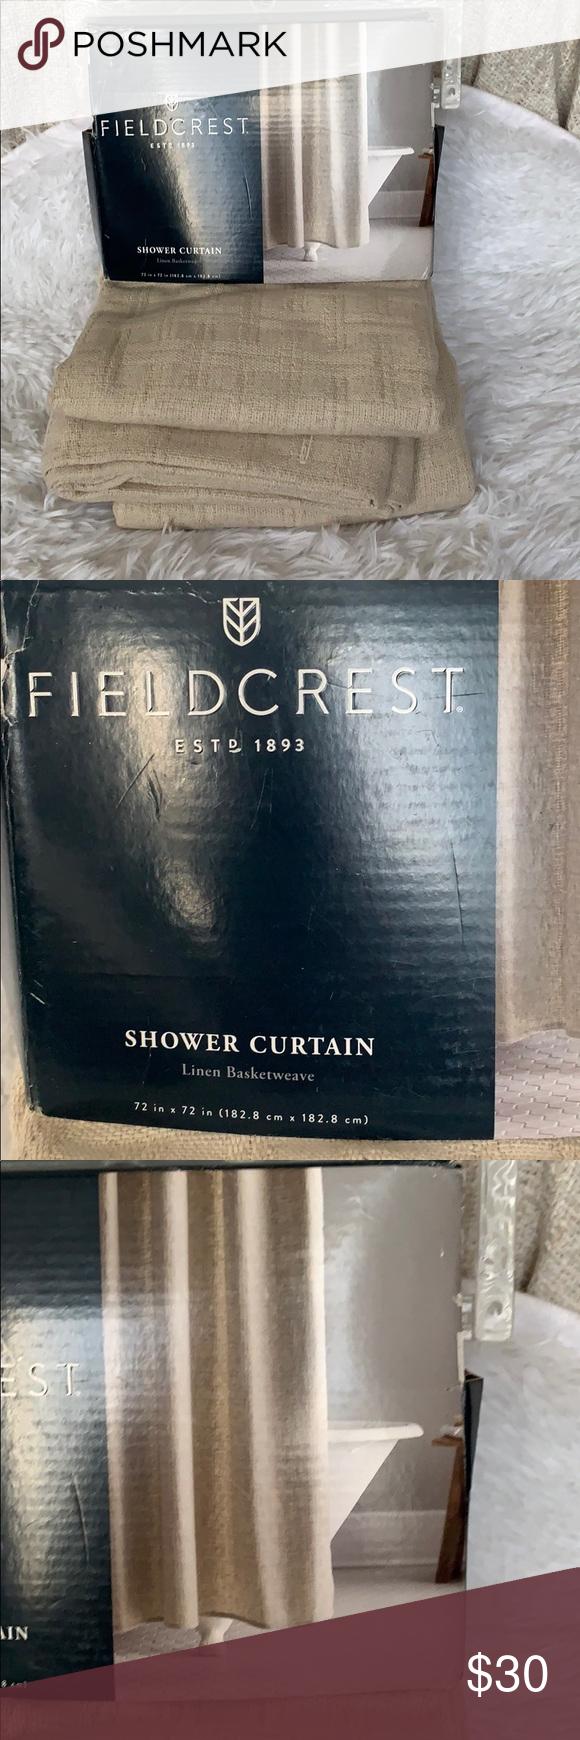 Nwt Fieldcrest Shower Curtain Linen Basketweave Nwt Fieldcrest